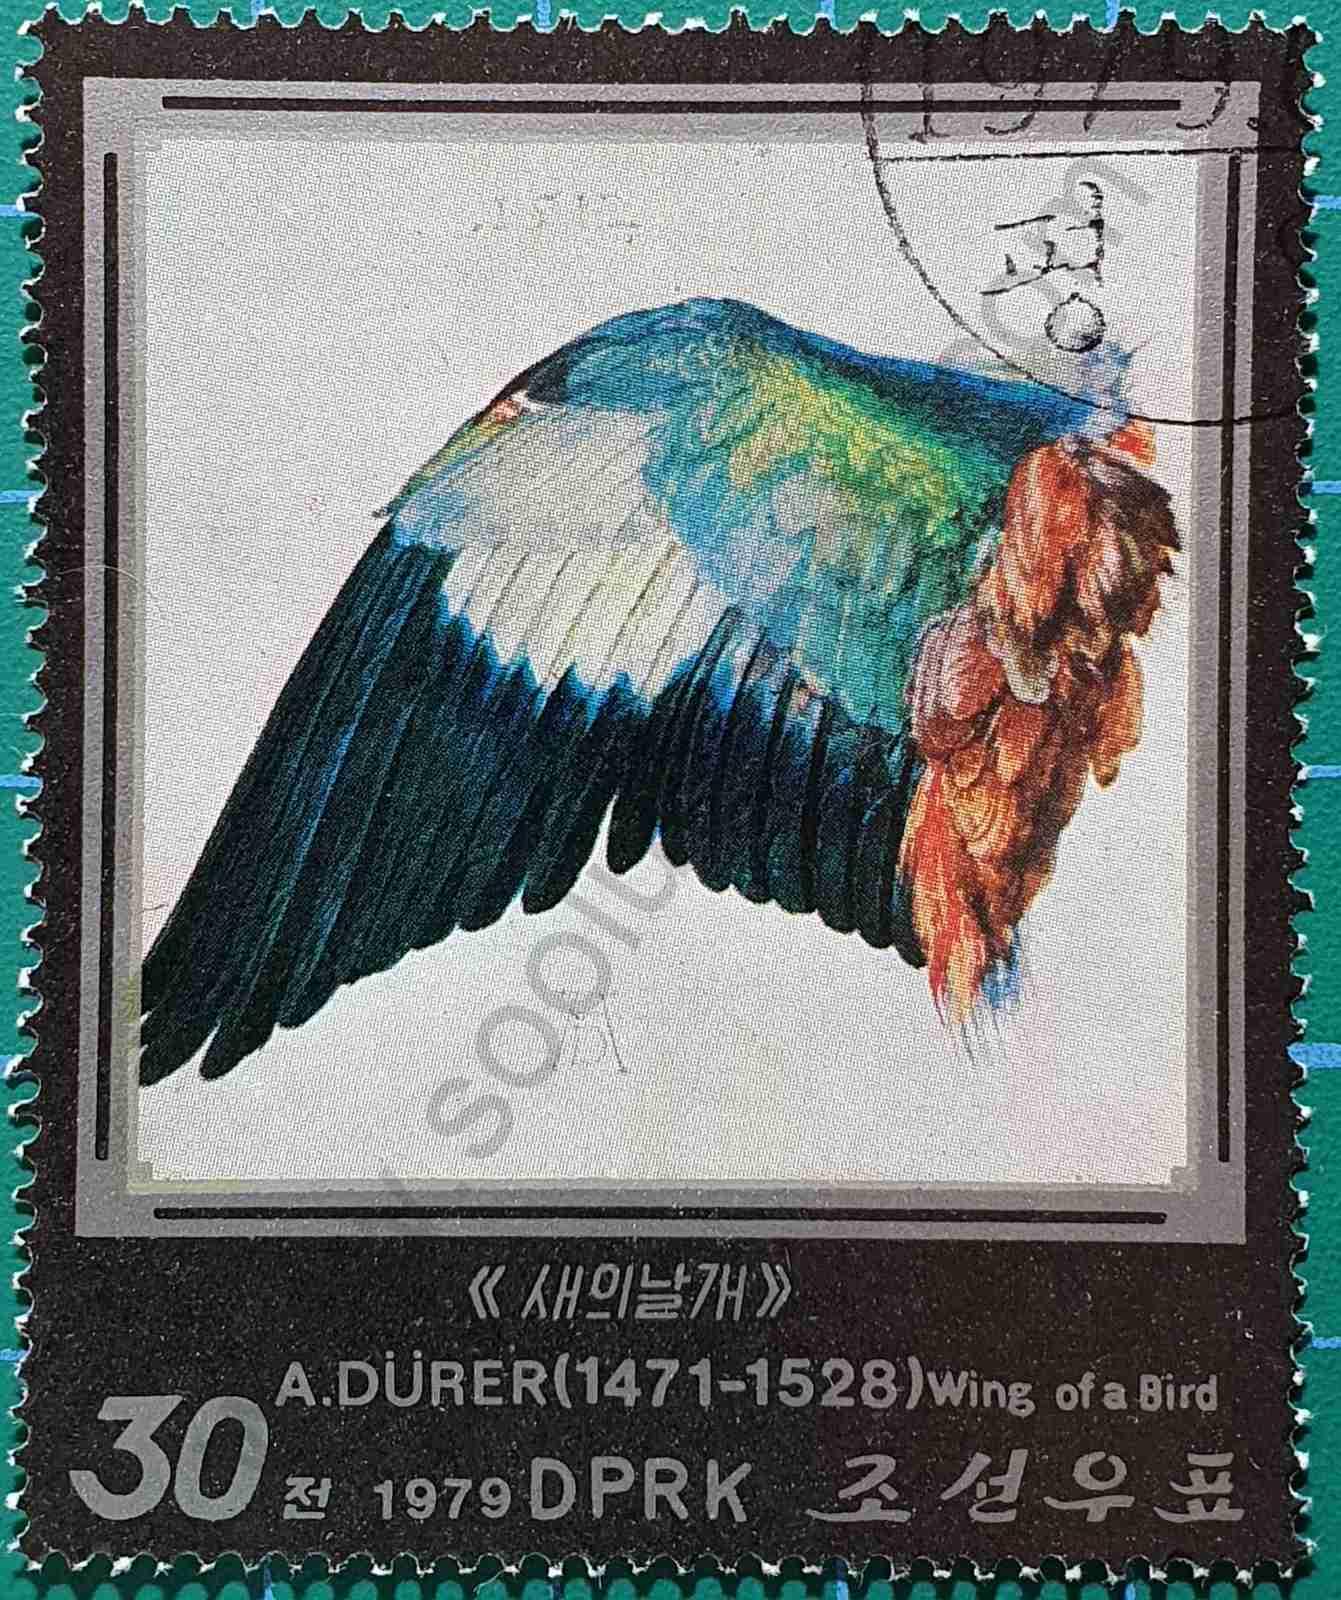 Ala de pájaro - sello Corea del Norte 1979